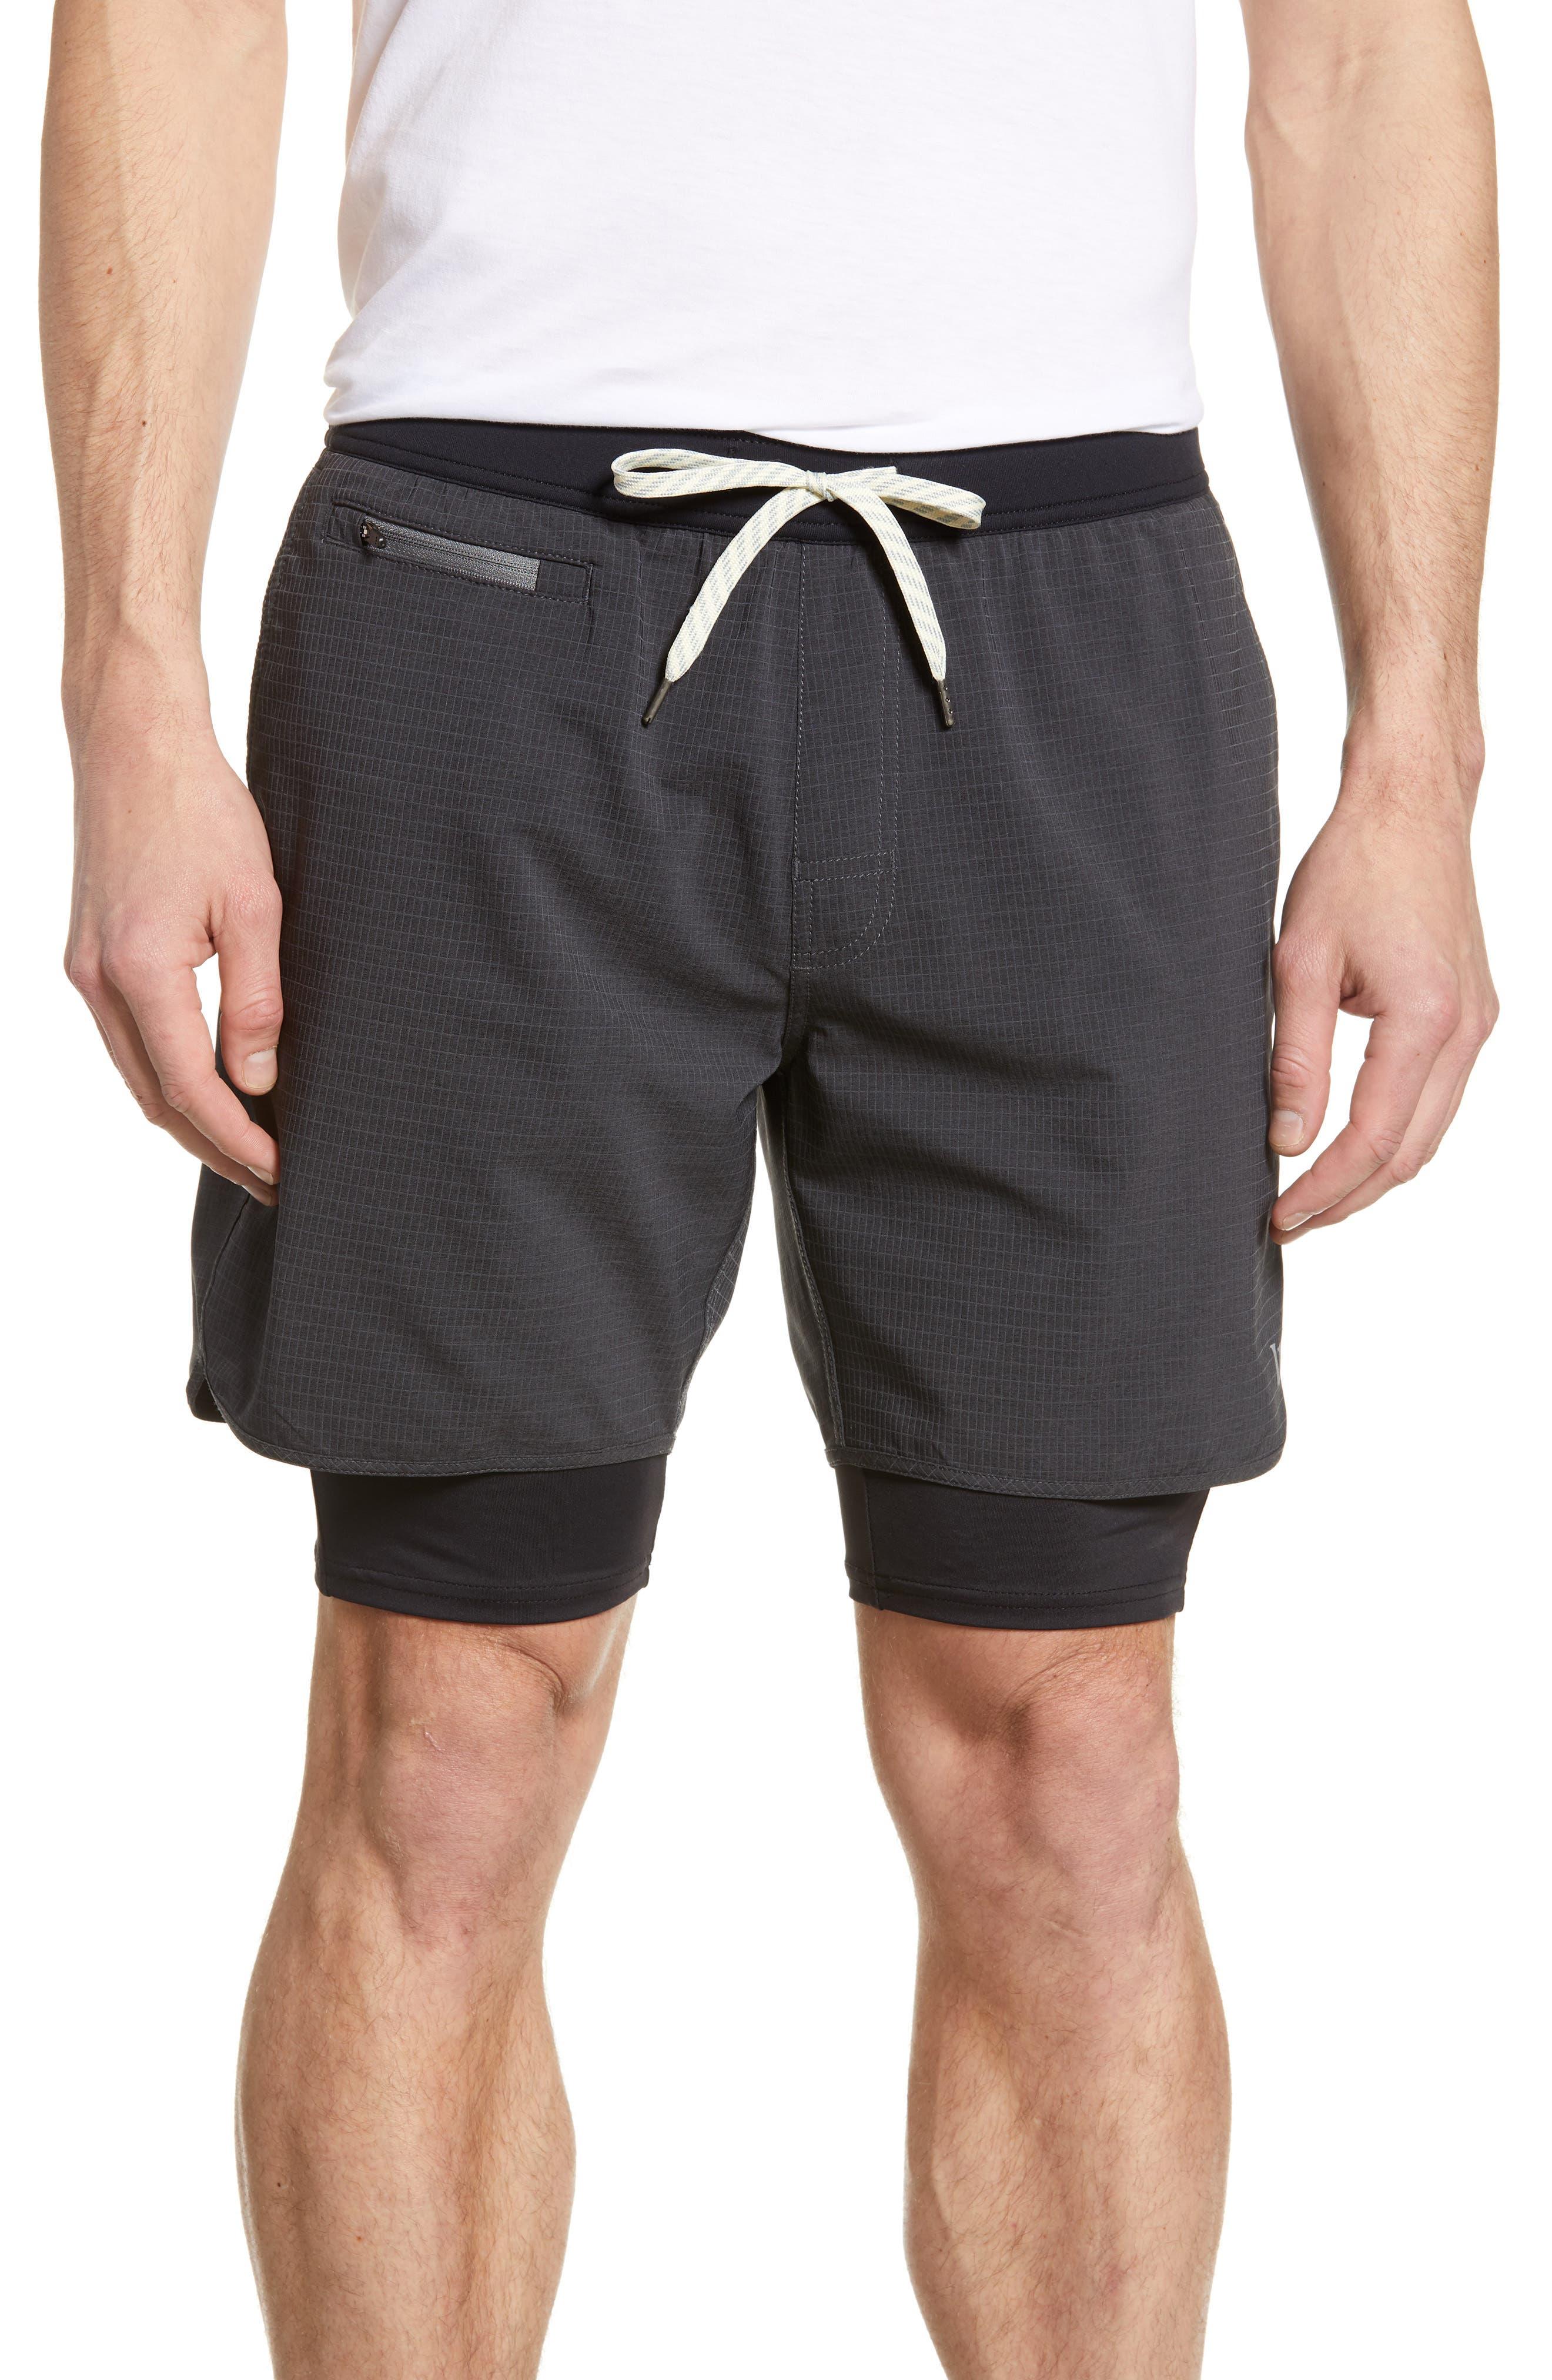 Vuori Stockton Layered Compression Performance Shorts, Black